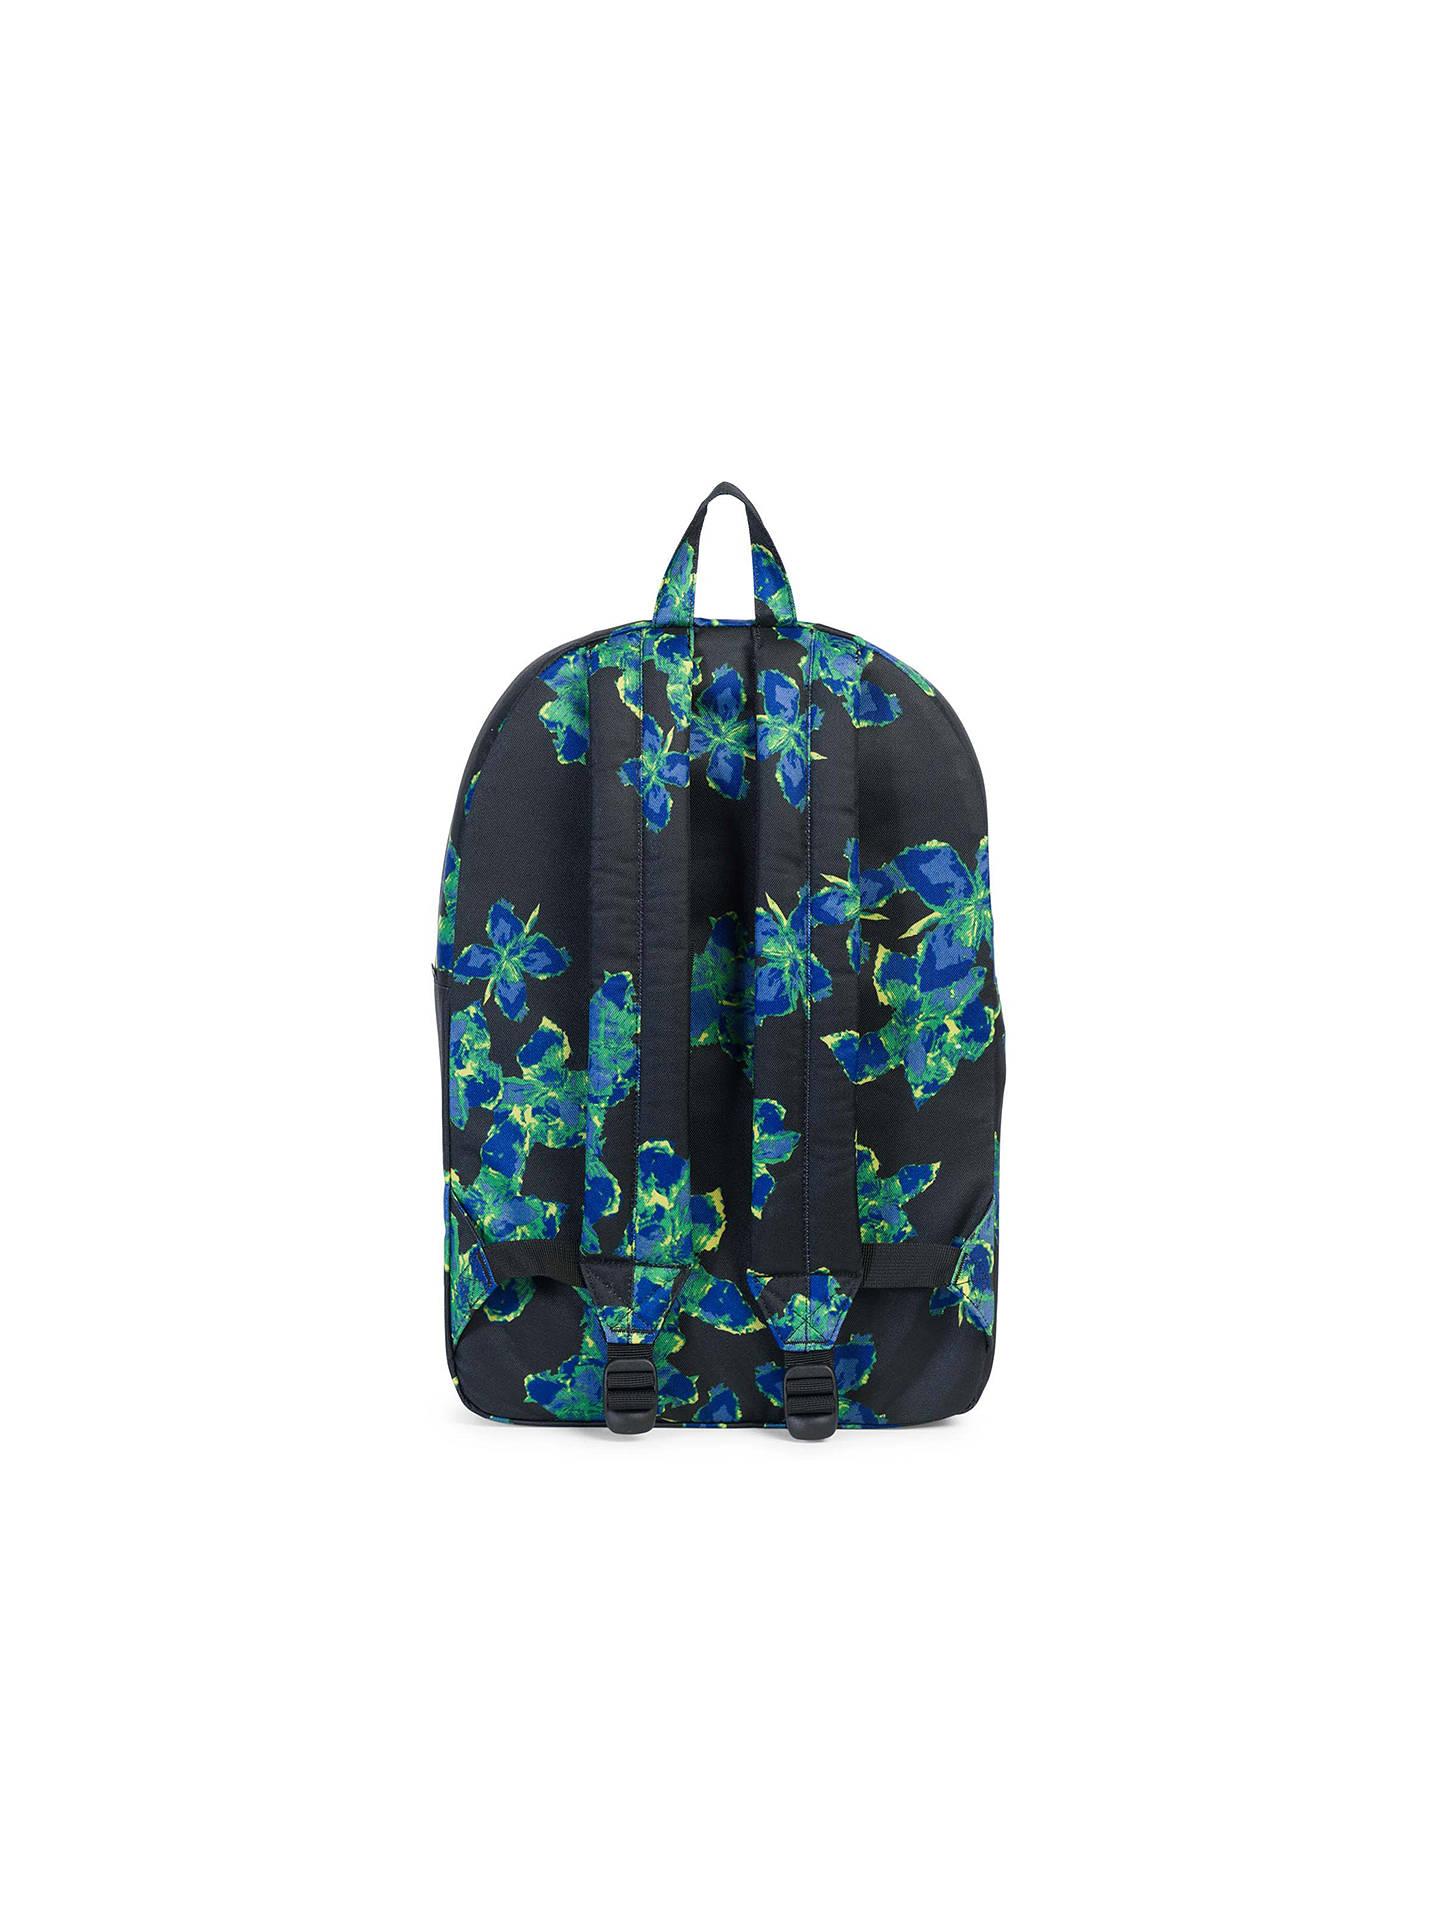 5143406fac ... Buy Herschel Supply Co. Classic Backpack